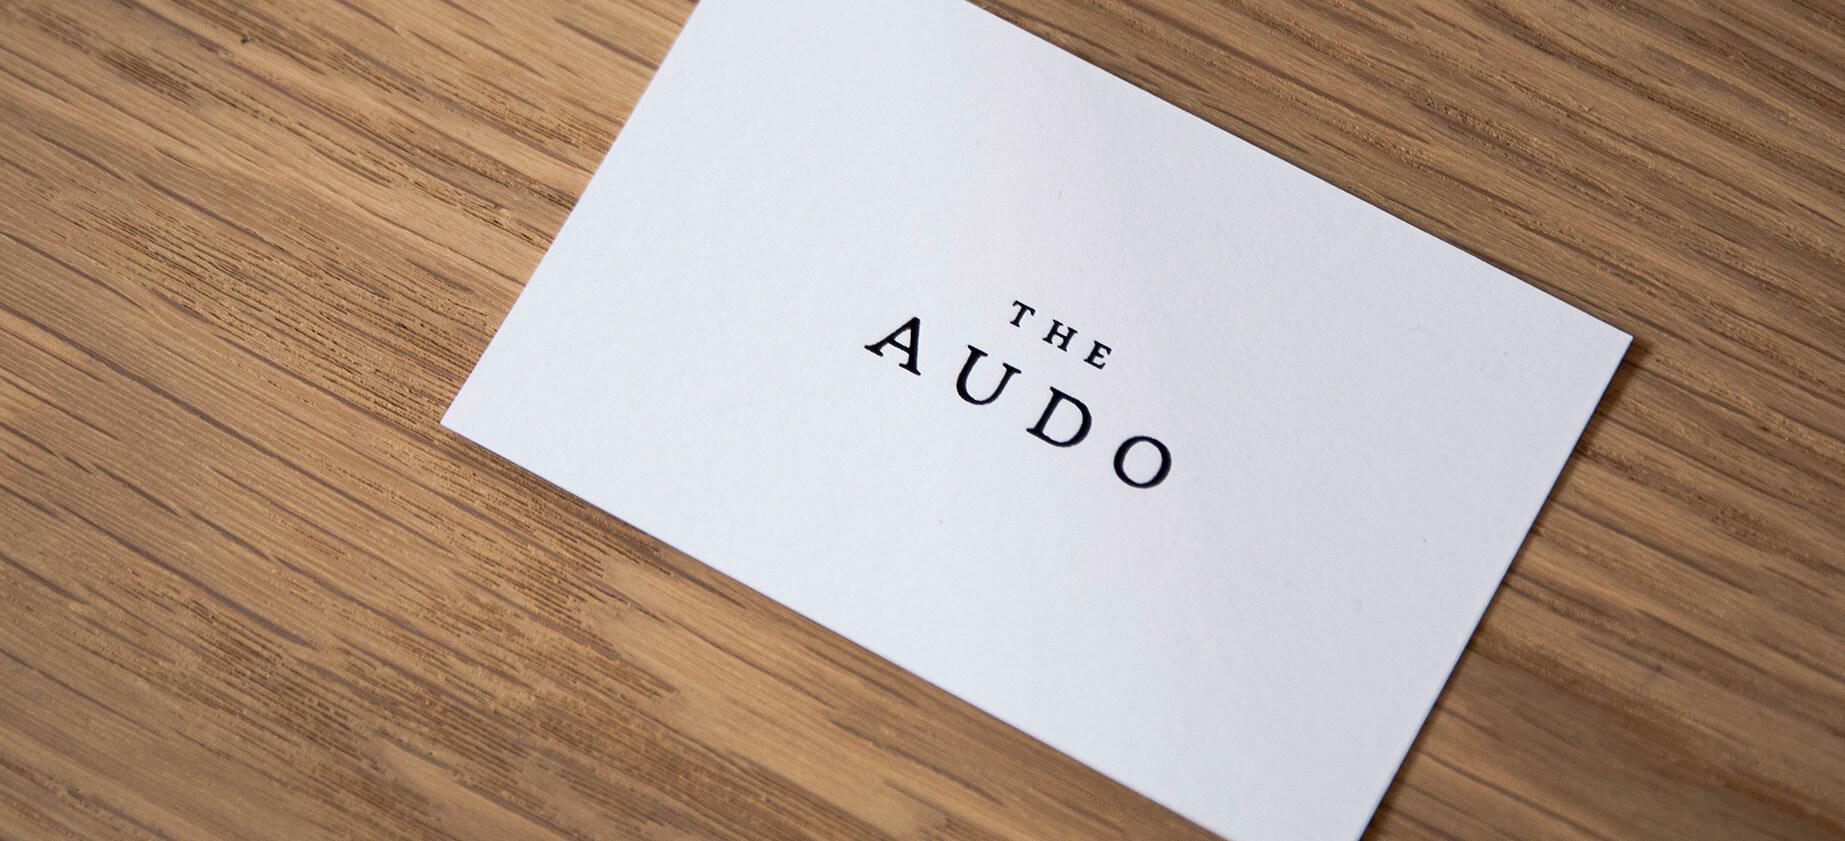 The Audo copenhagen food